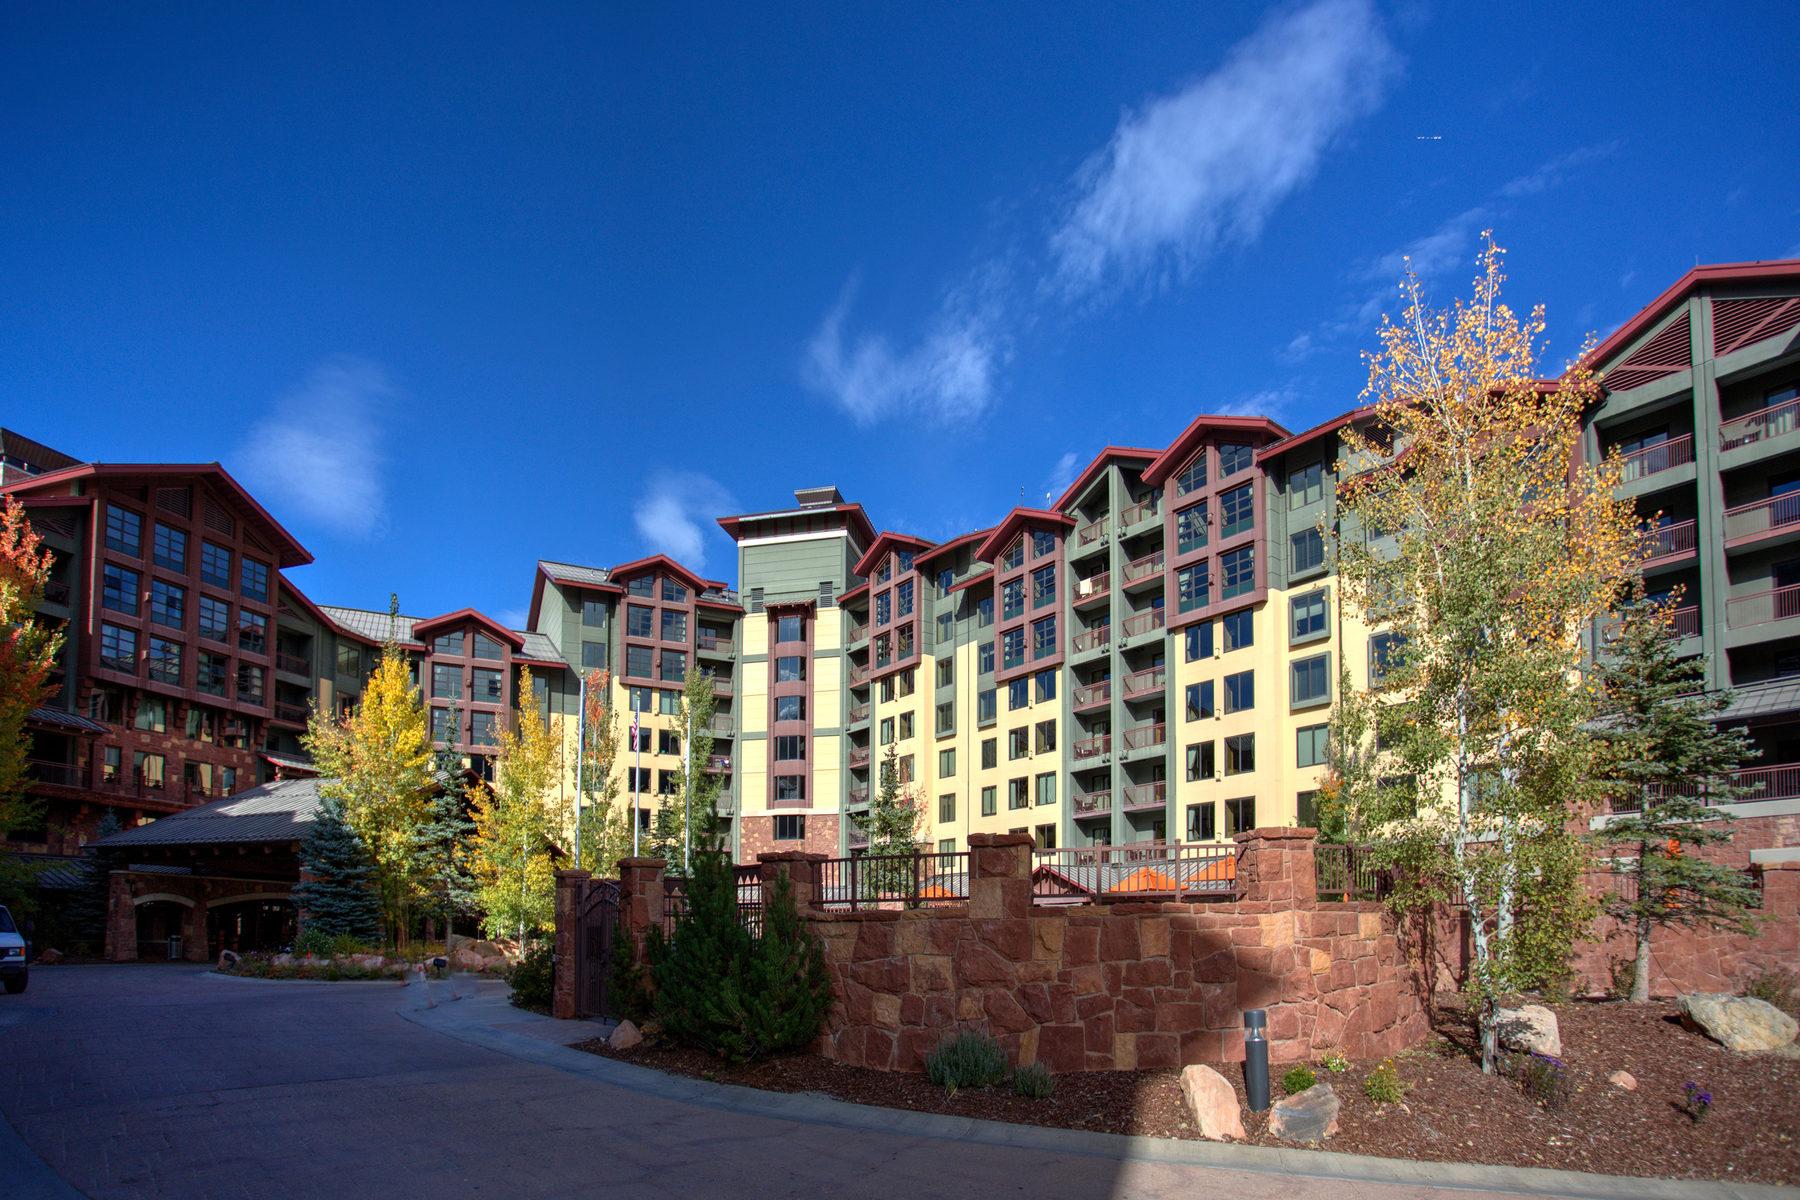 部分所有权 为 销售 在 AAA 4-Diamond Rated Golf and Ski Condo 3855 Grand Summit Dr Unit #414/416 Q2 帕克城, 犹他州 84098 美国